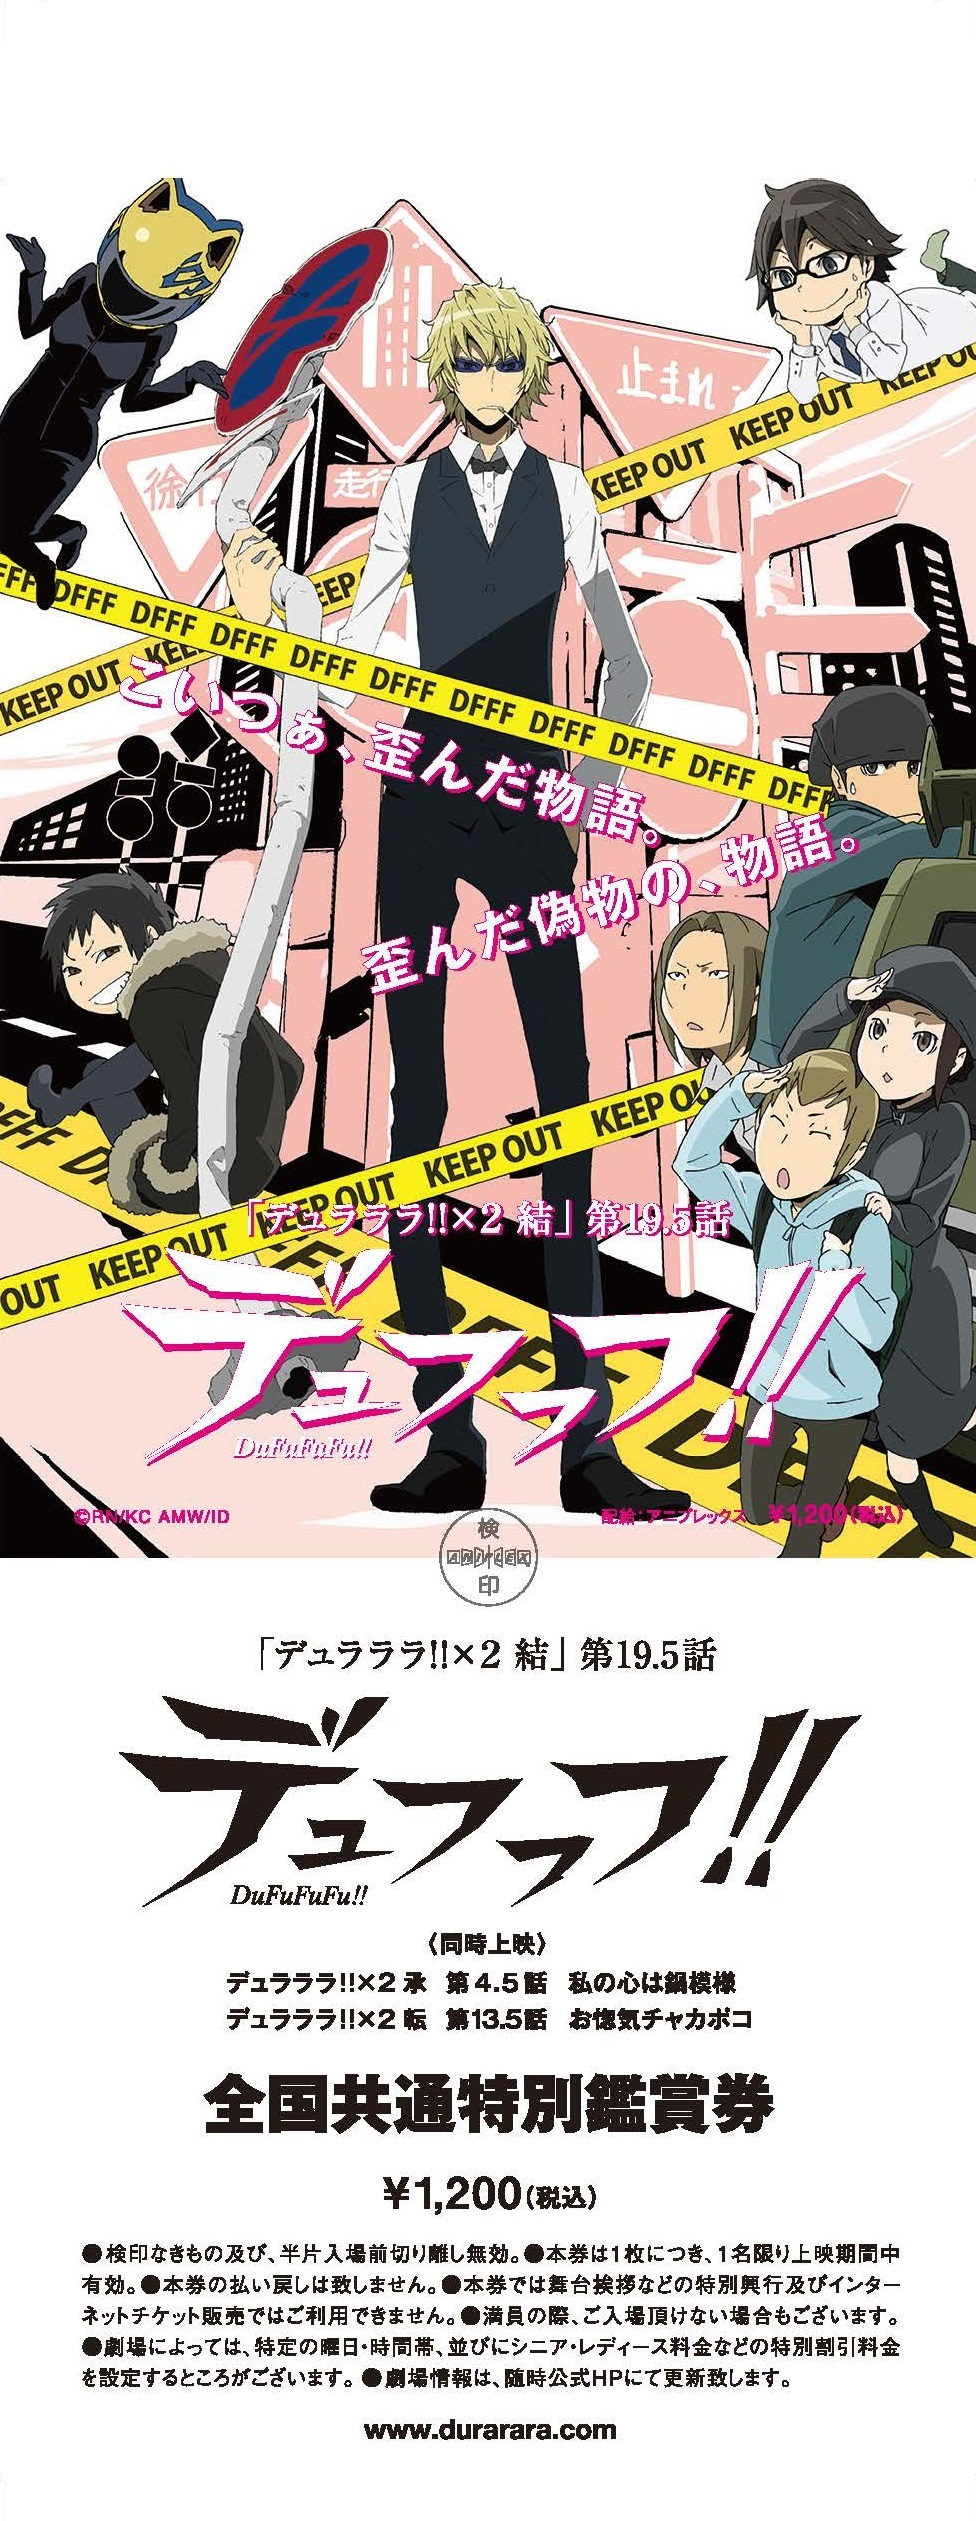 (C)2014 成田良悟/KADOKAWA アスキー・メディアワークス刊/池袋ダラーズ